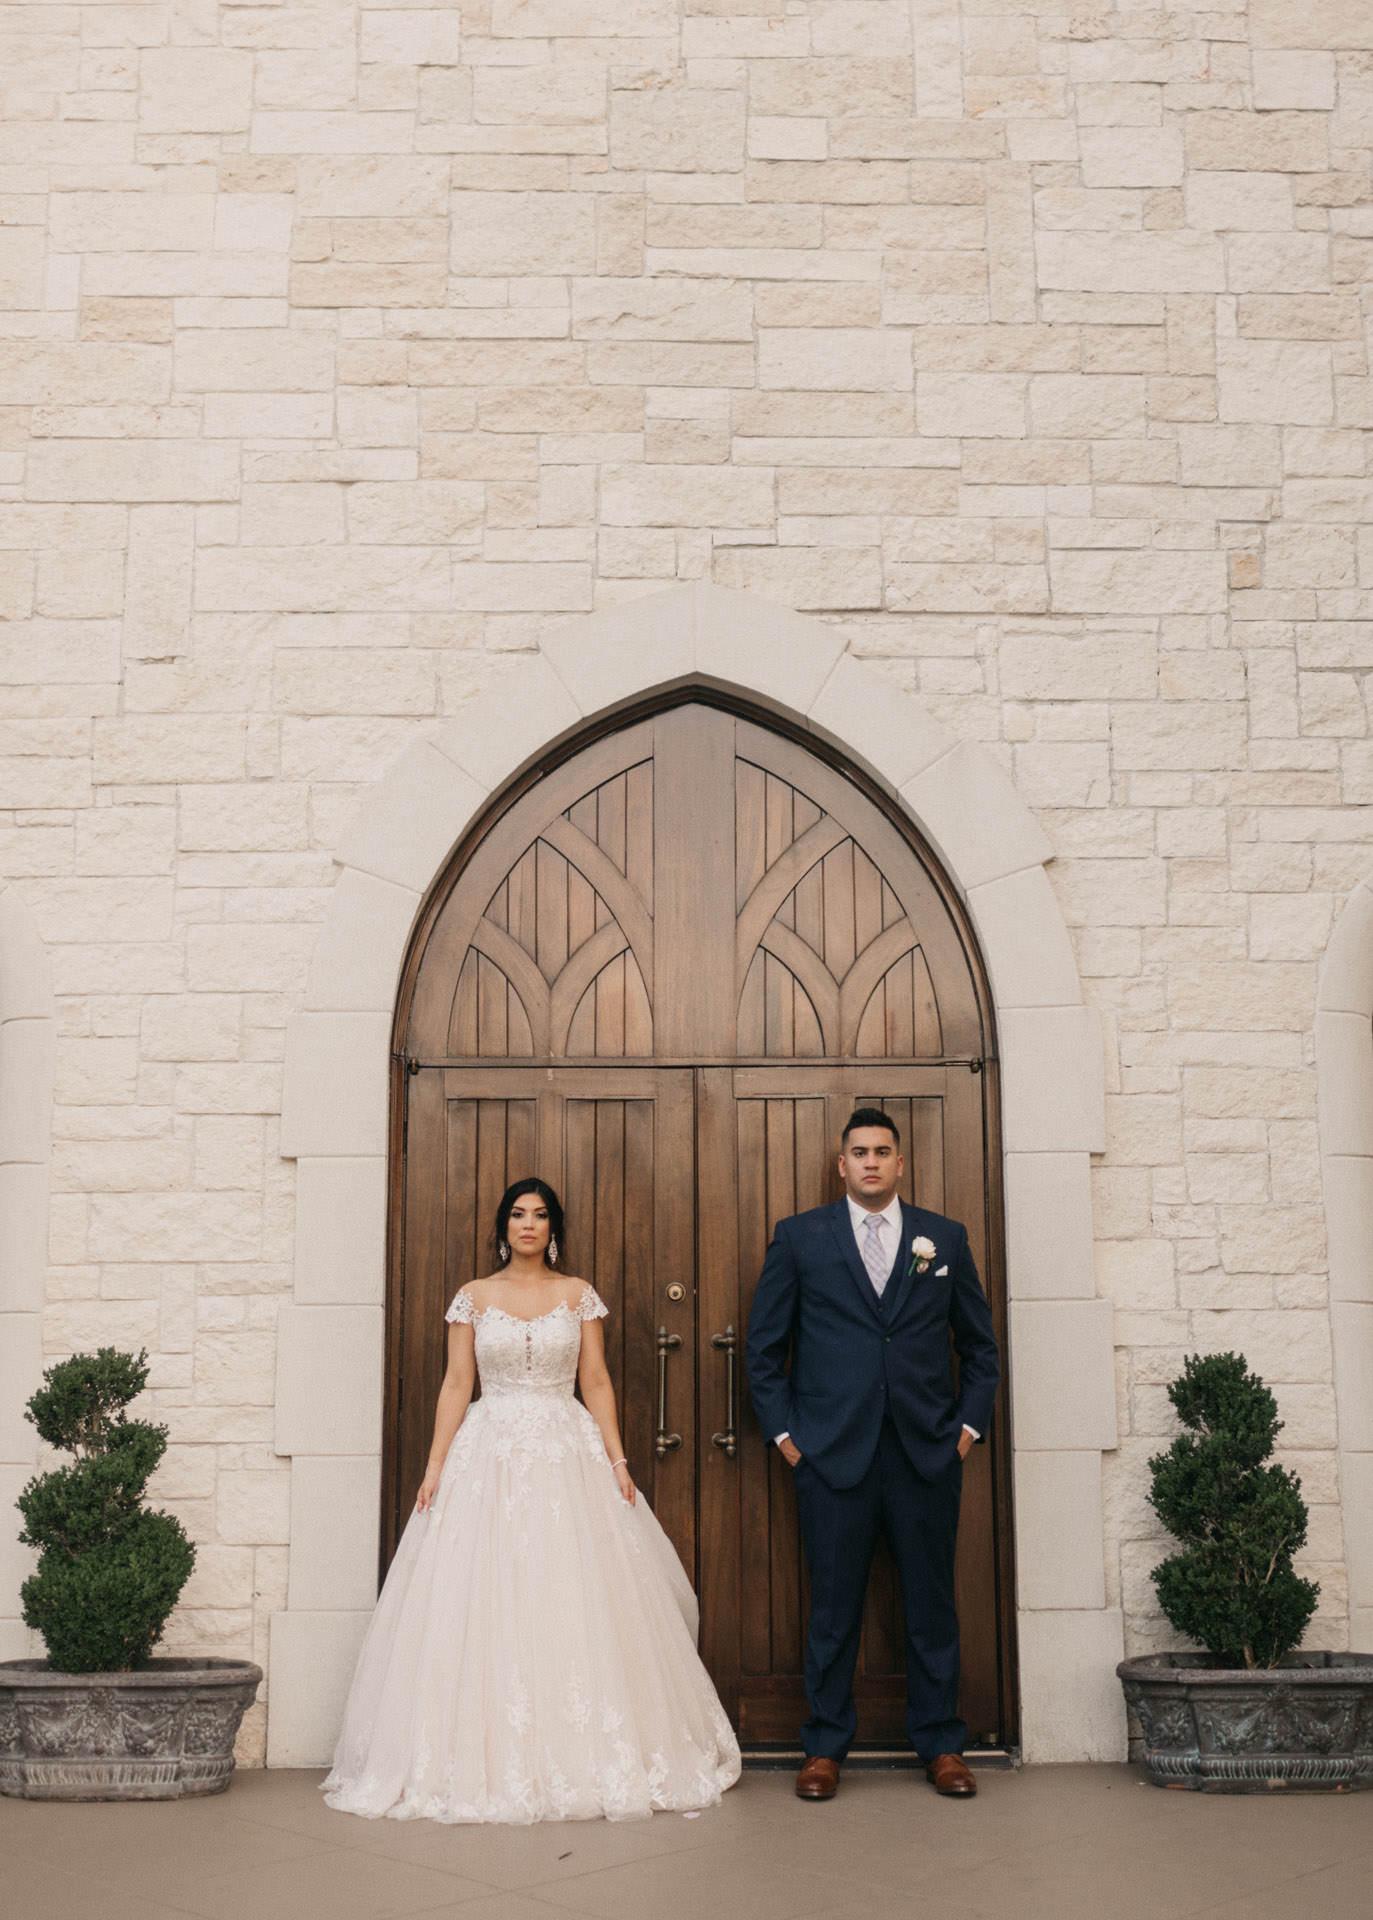 lexi-michael-wedding-blog-sm-106.jpg